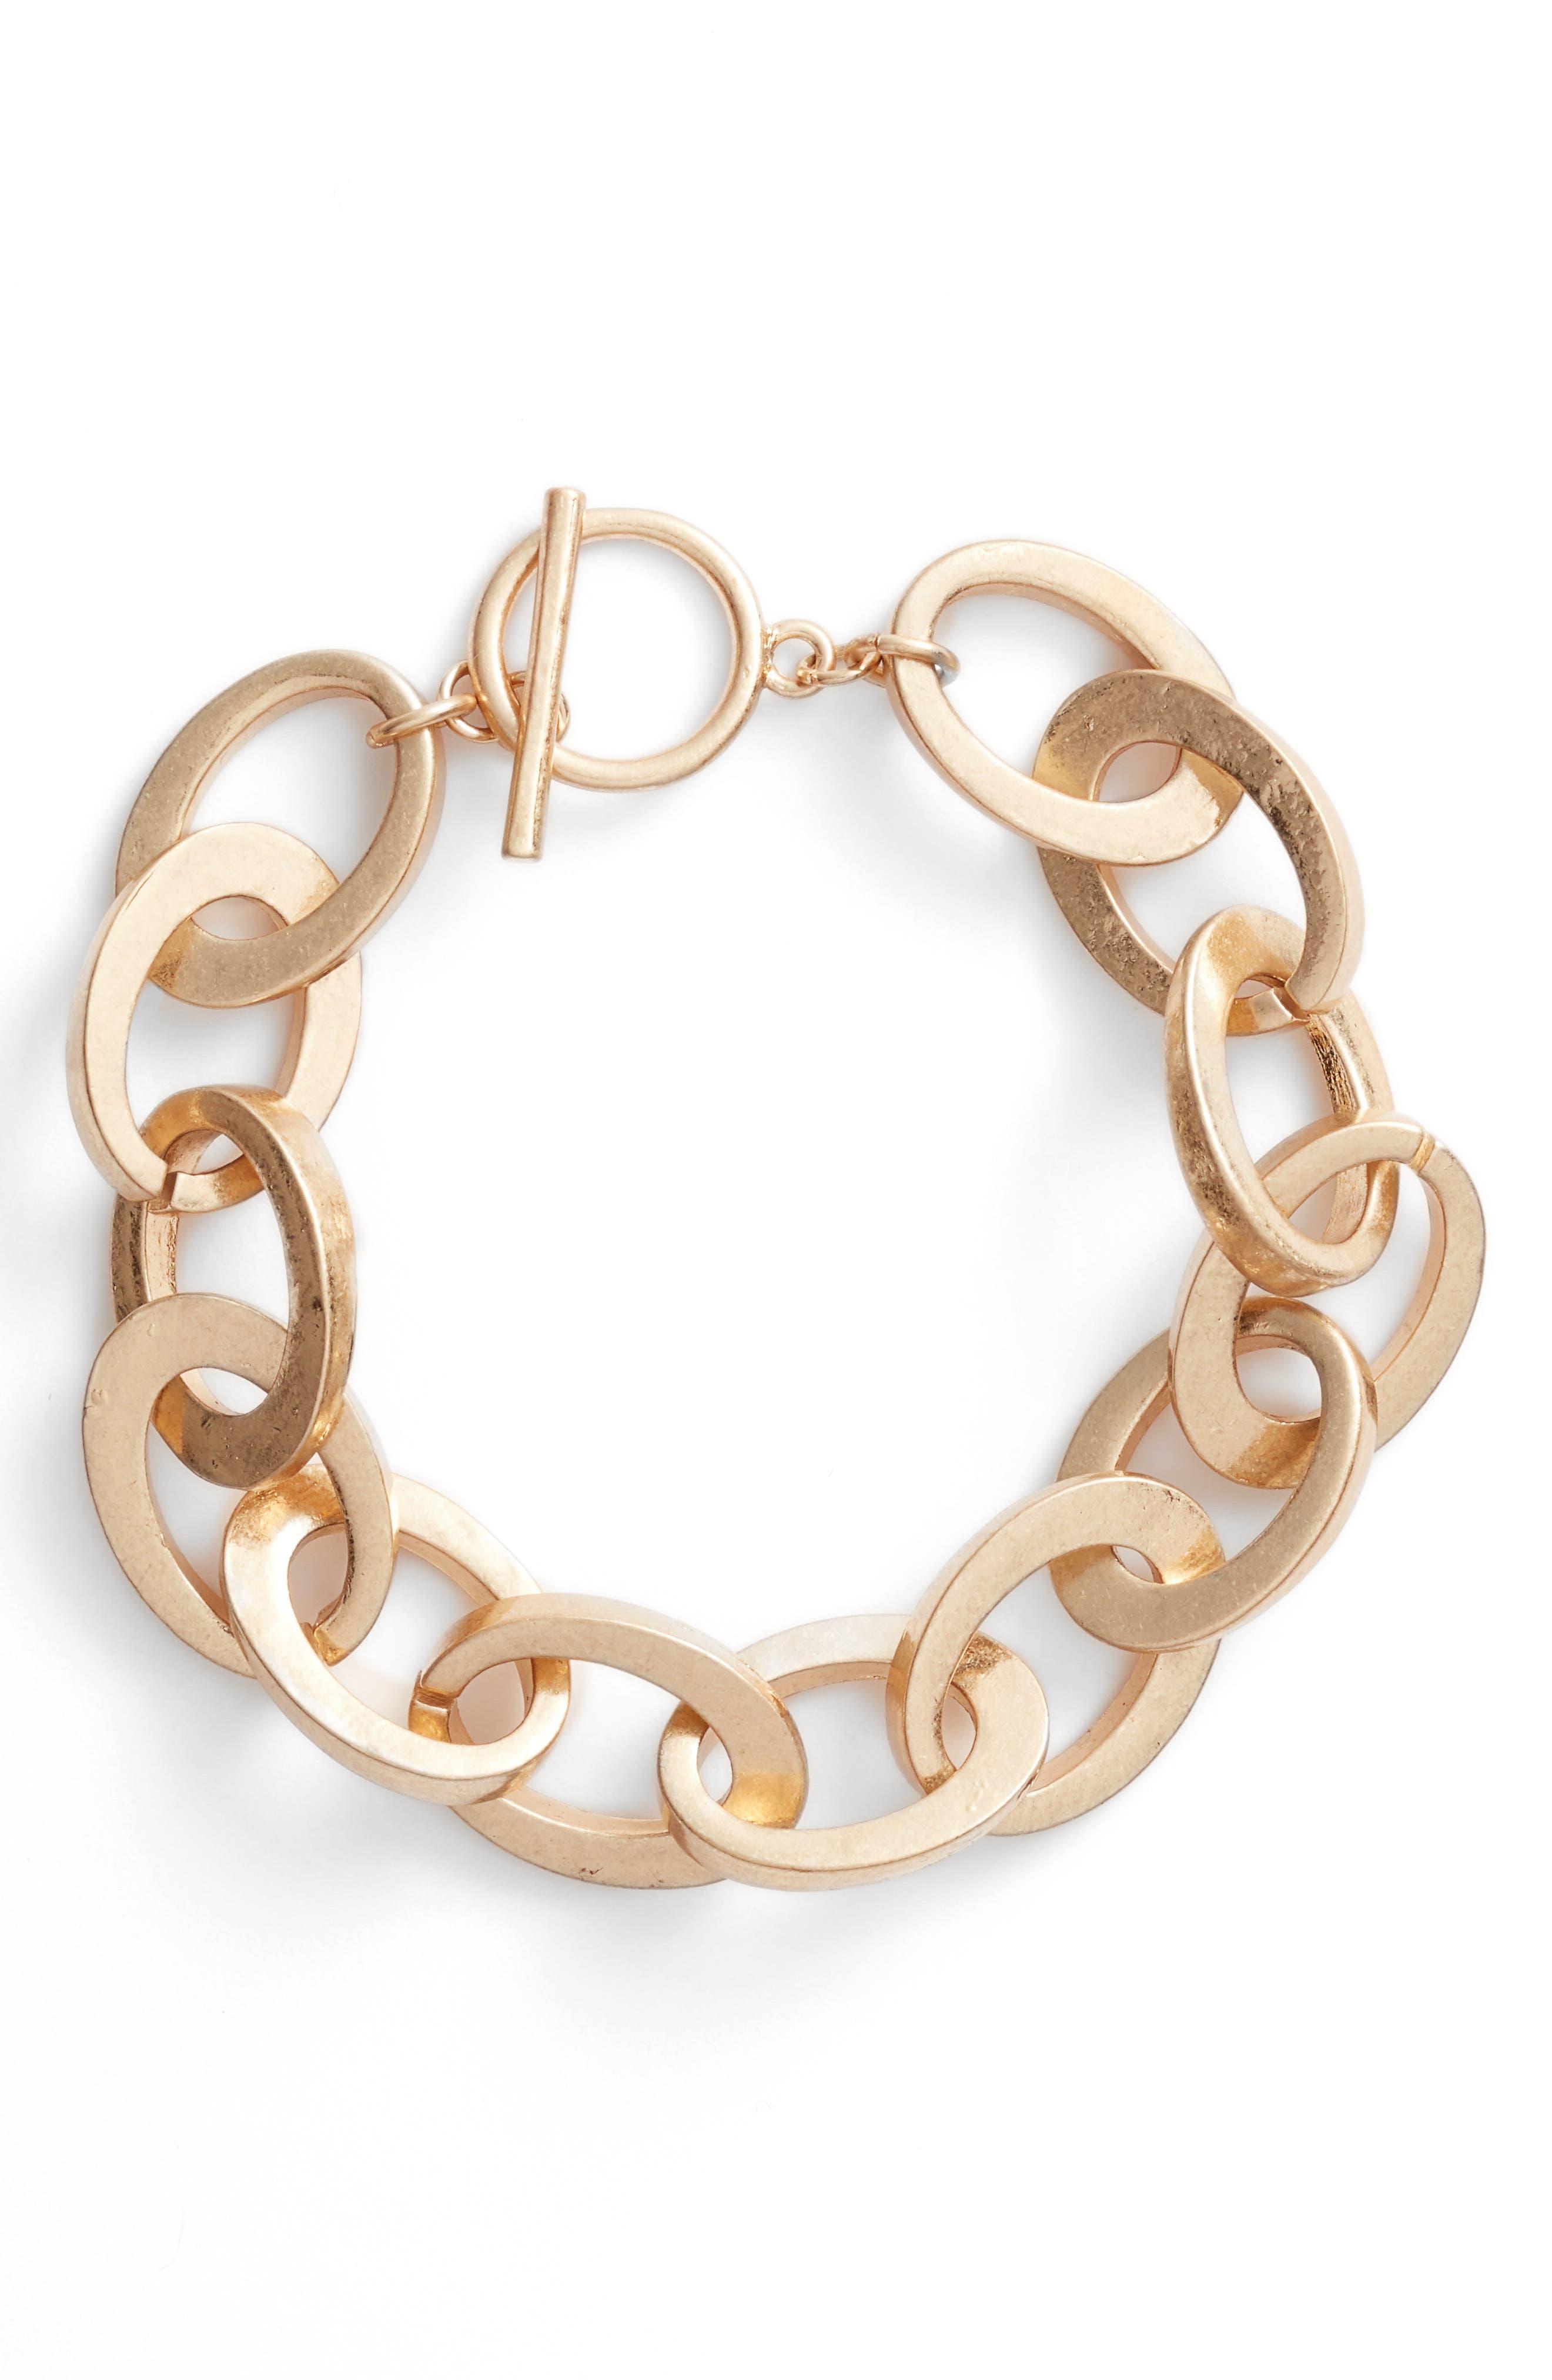 Rolo Bar Ring Bracelet,                             Main thumbnail 1, color,                             GOLD